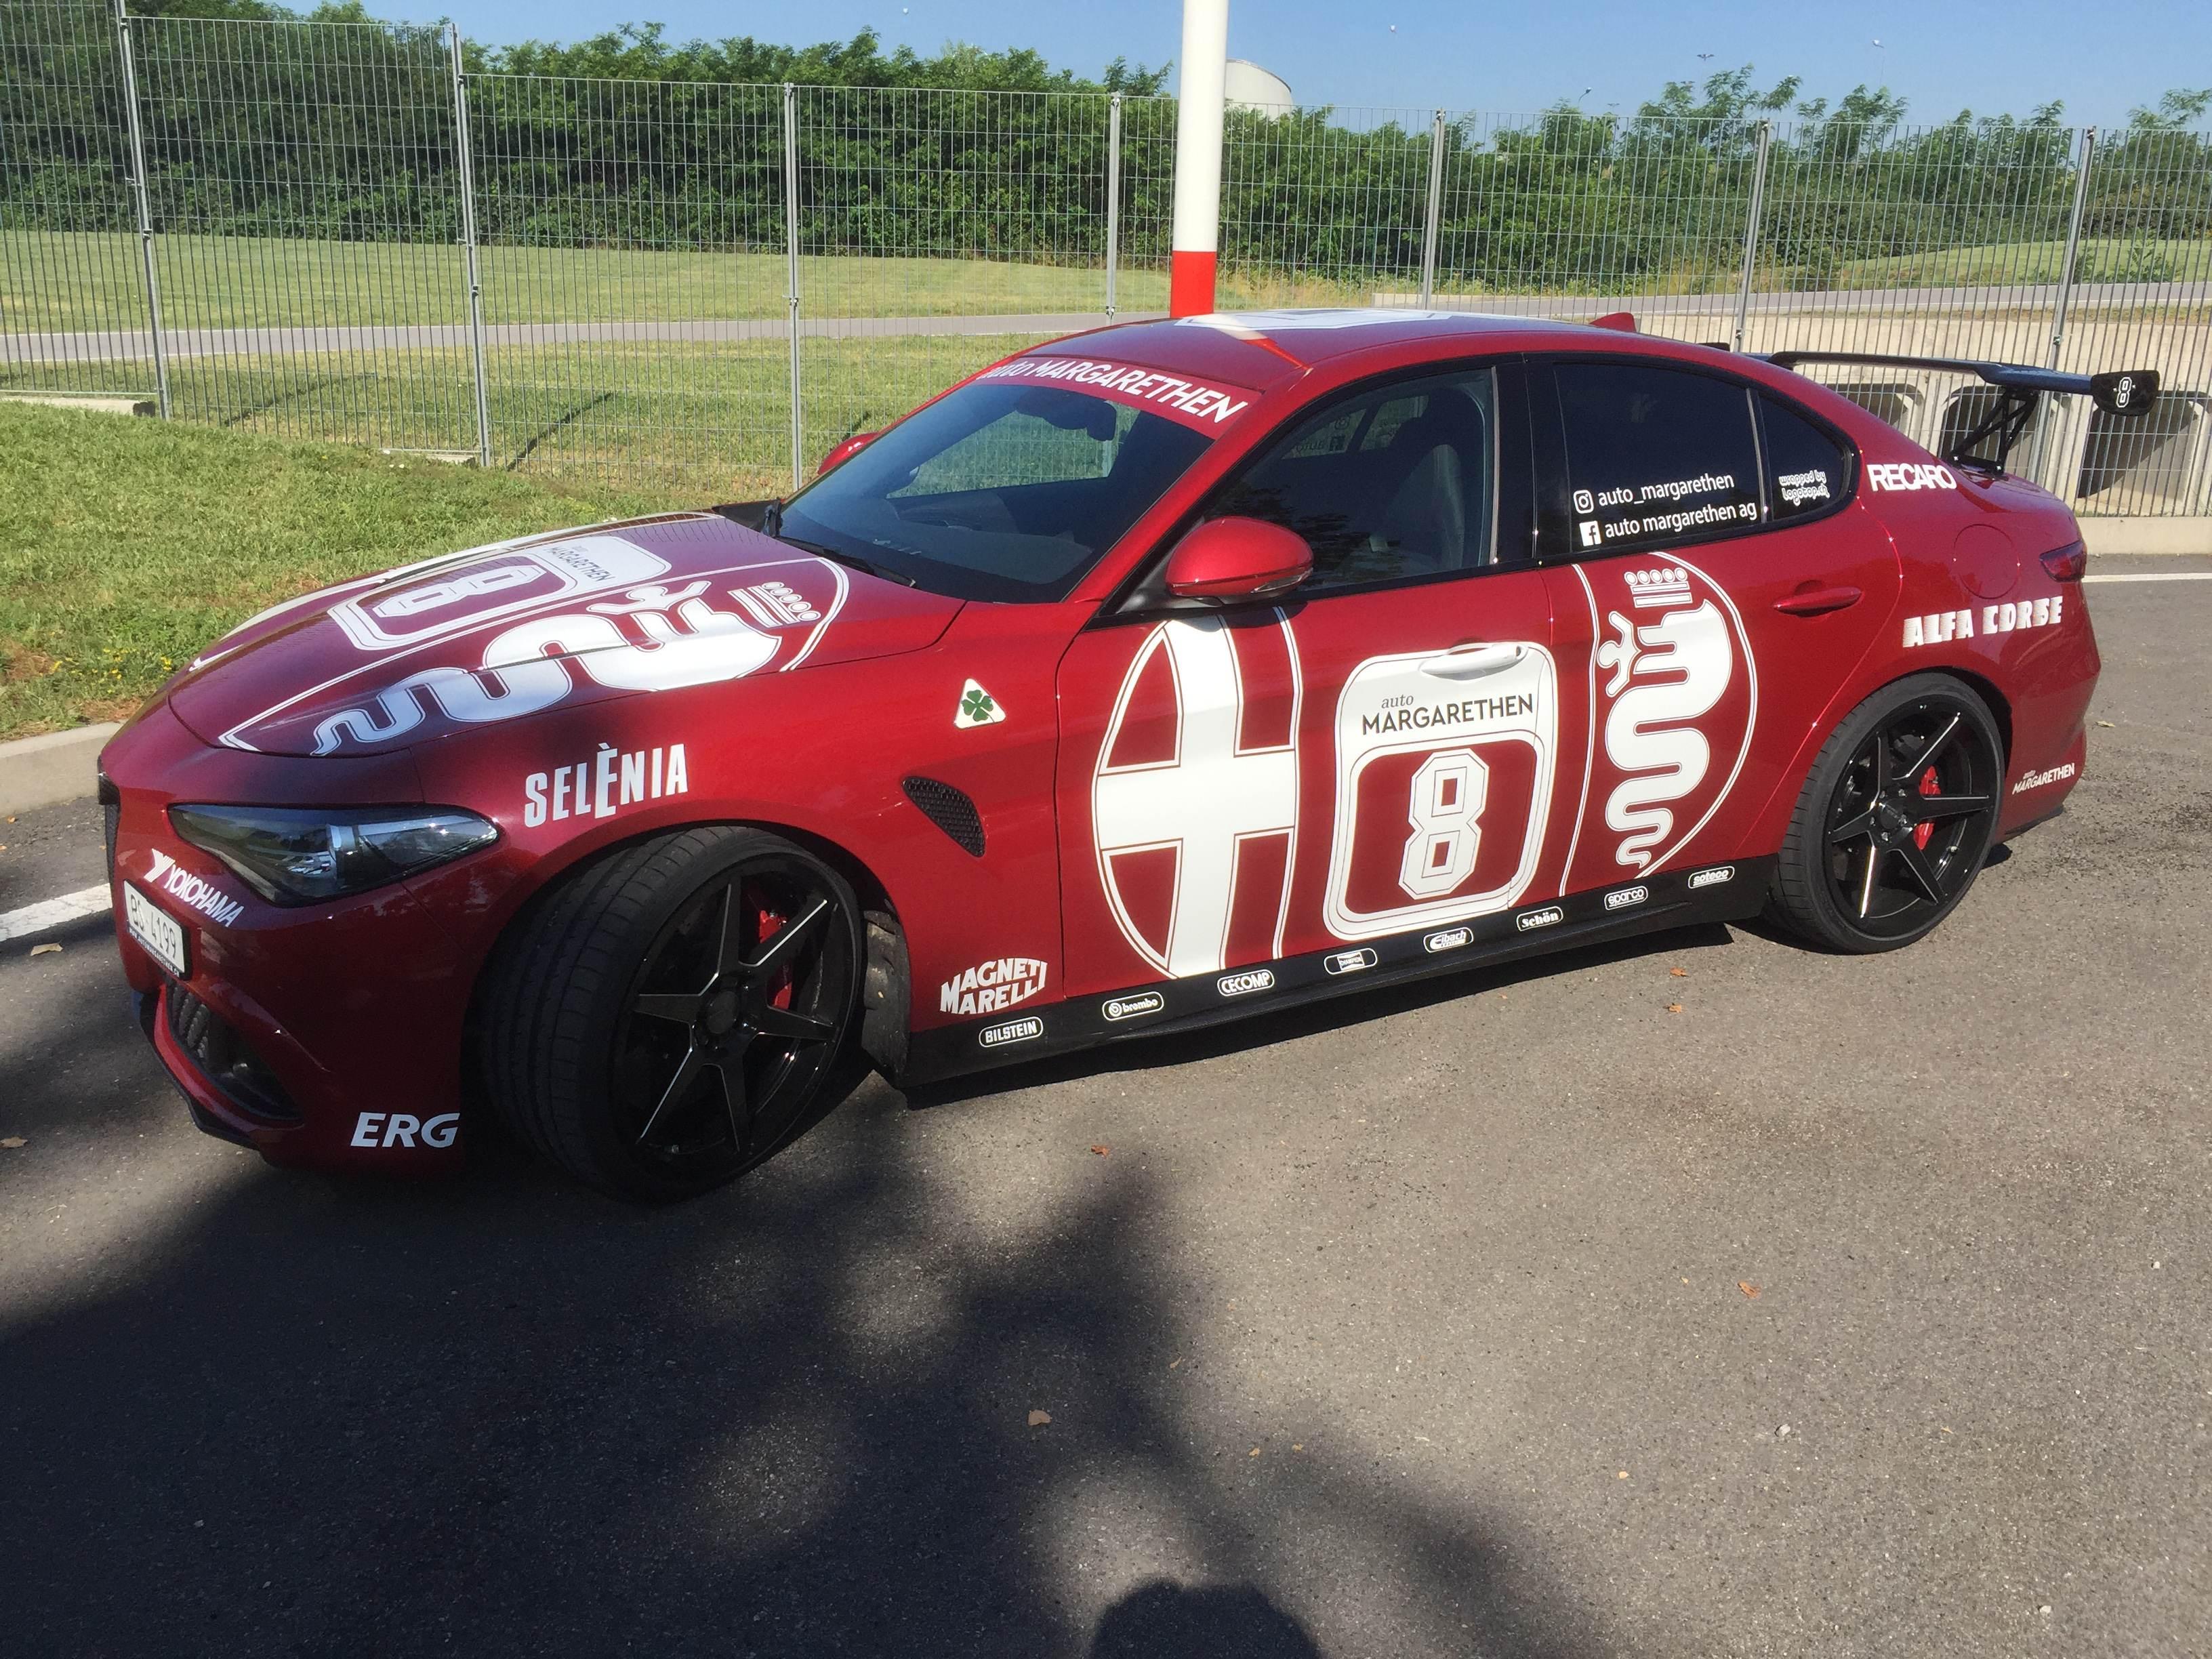 foto Alfa Romeo day 2019 - 11